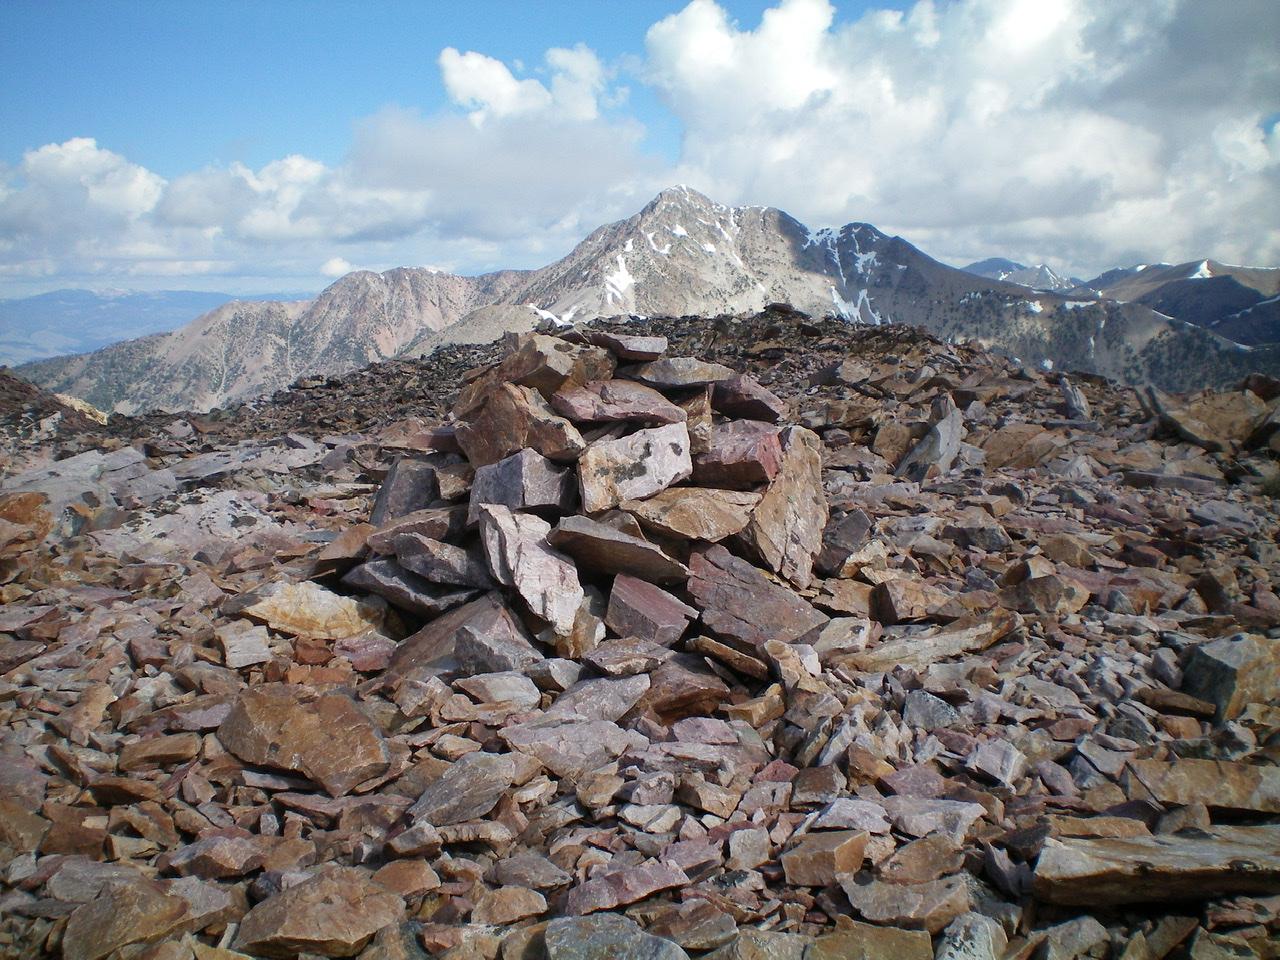 The rebuilt summit cairn atop Peak 10349. Livingston Douglas